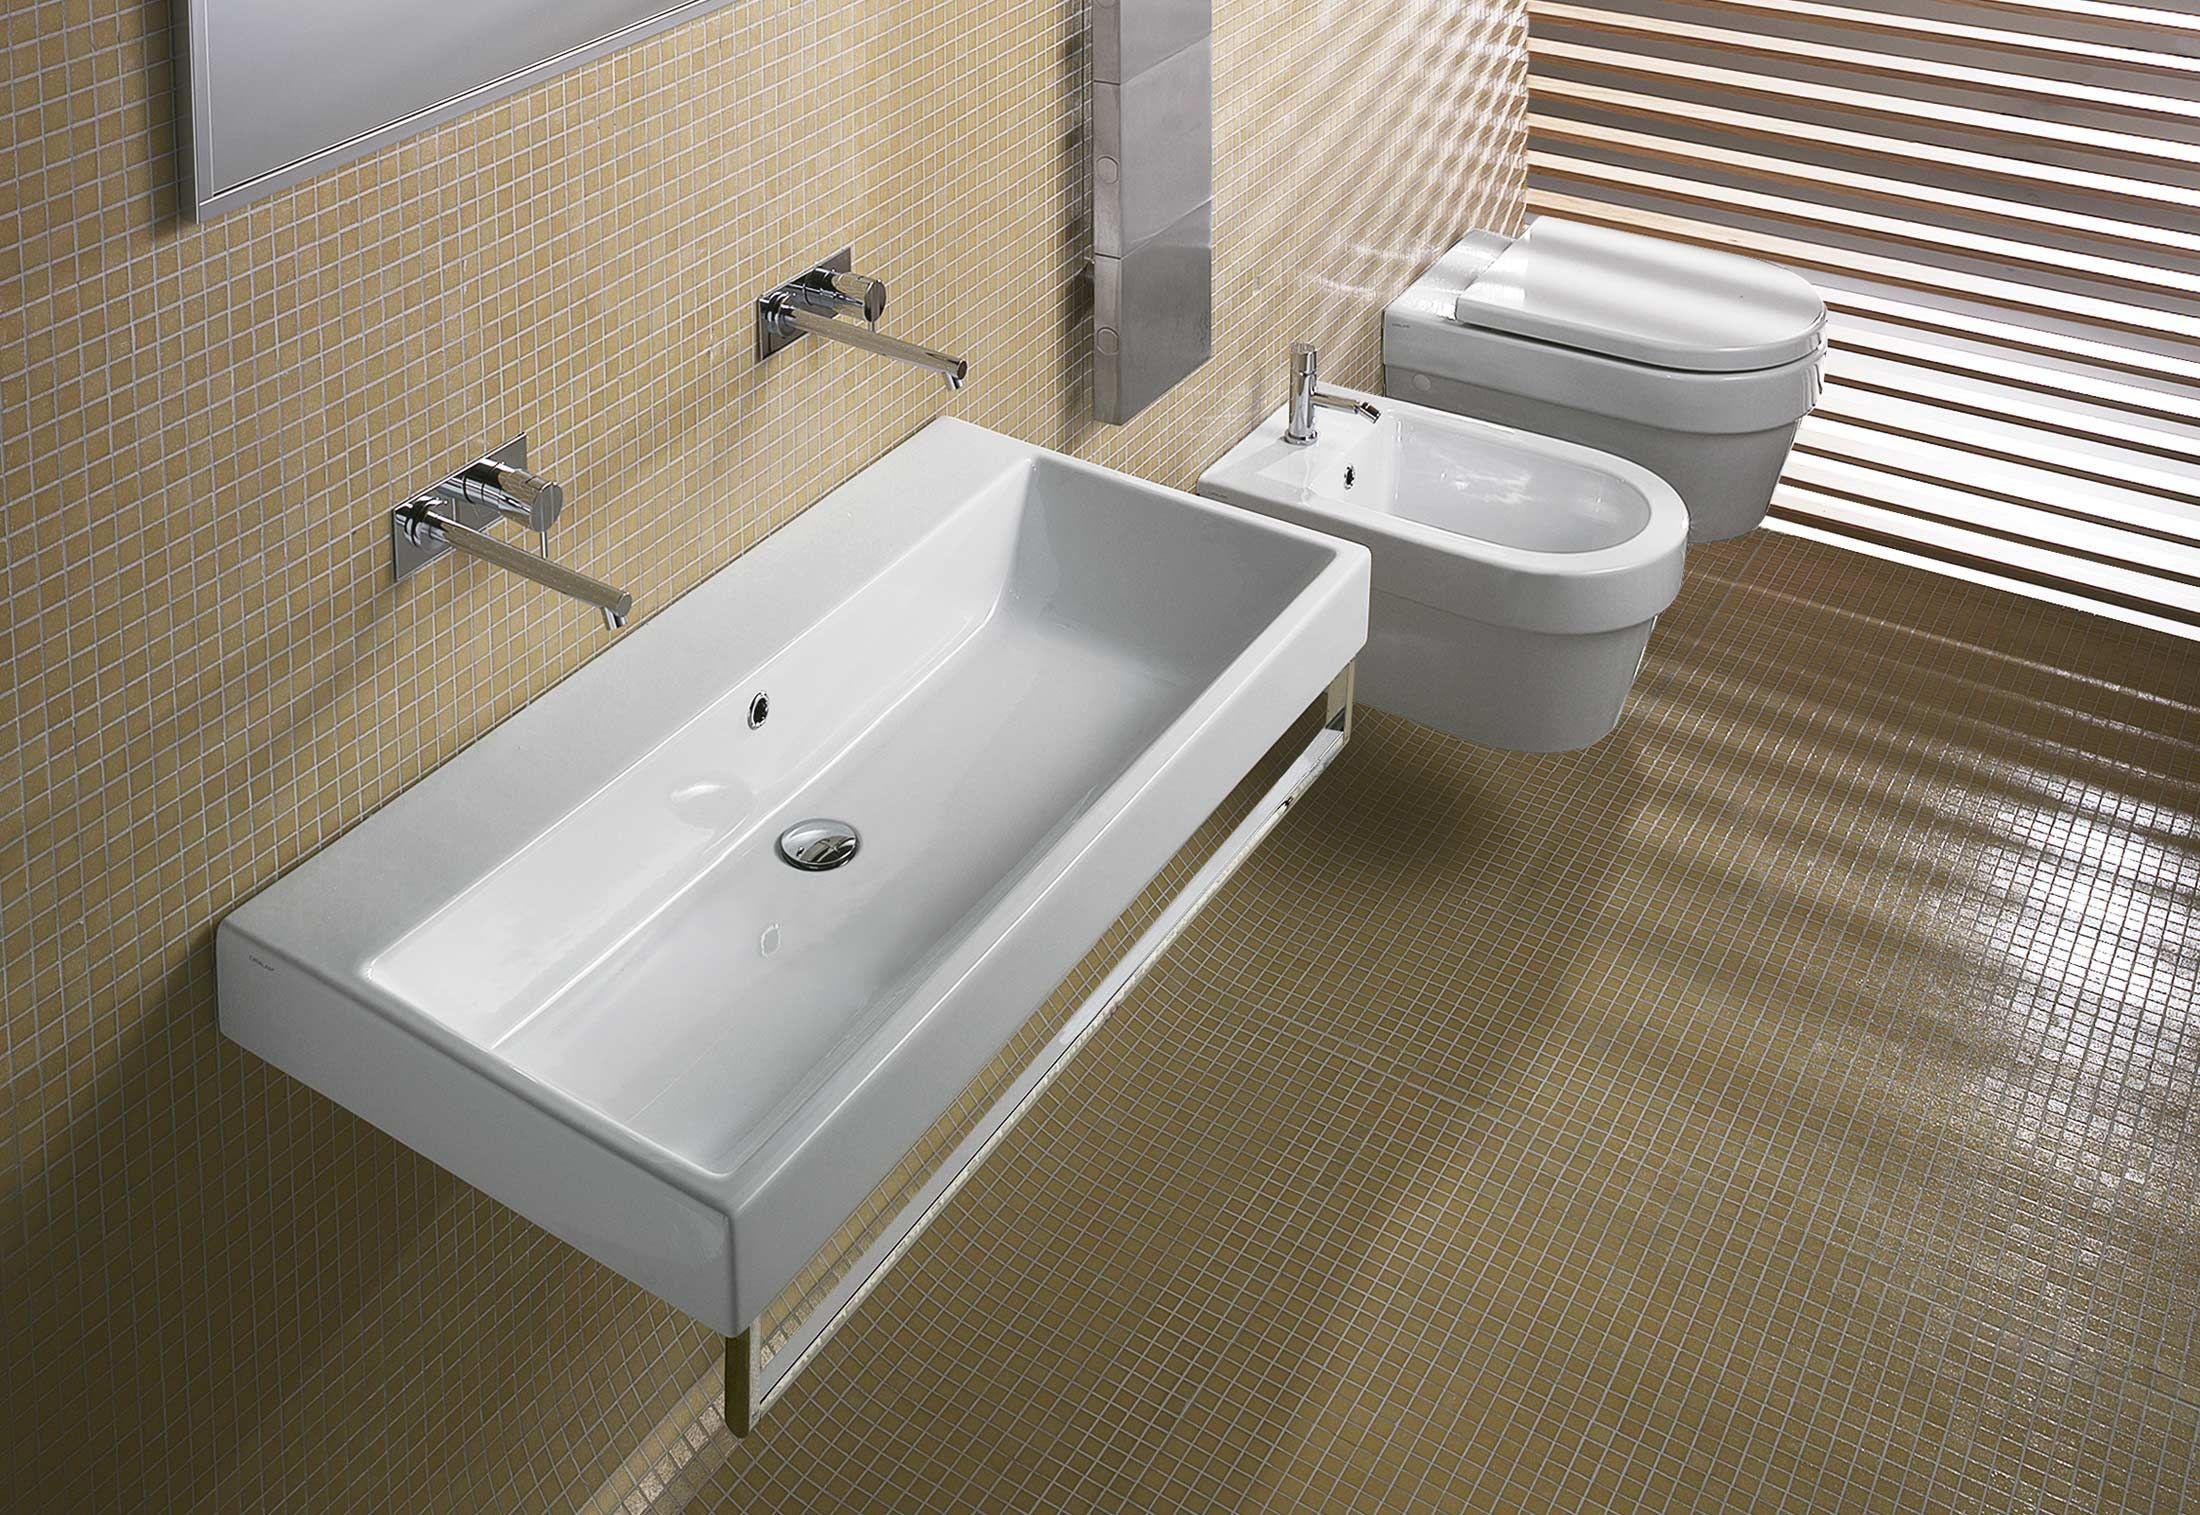 Catalano Zero 100 Wash Basin Sink With Images Wash Basin